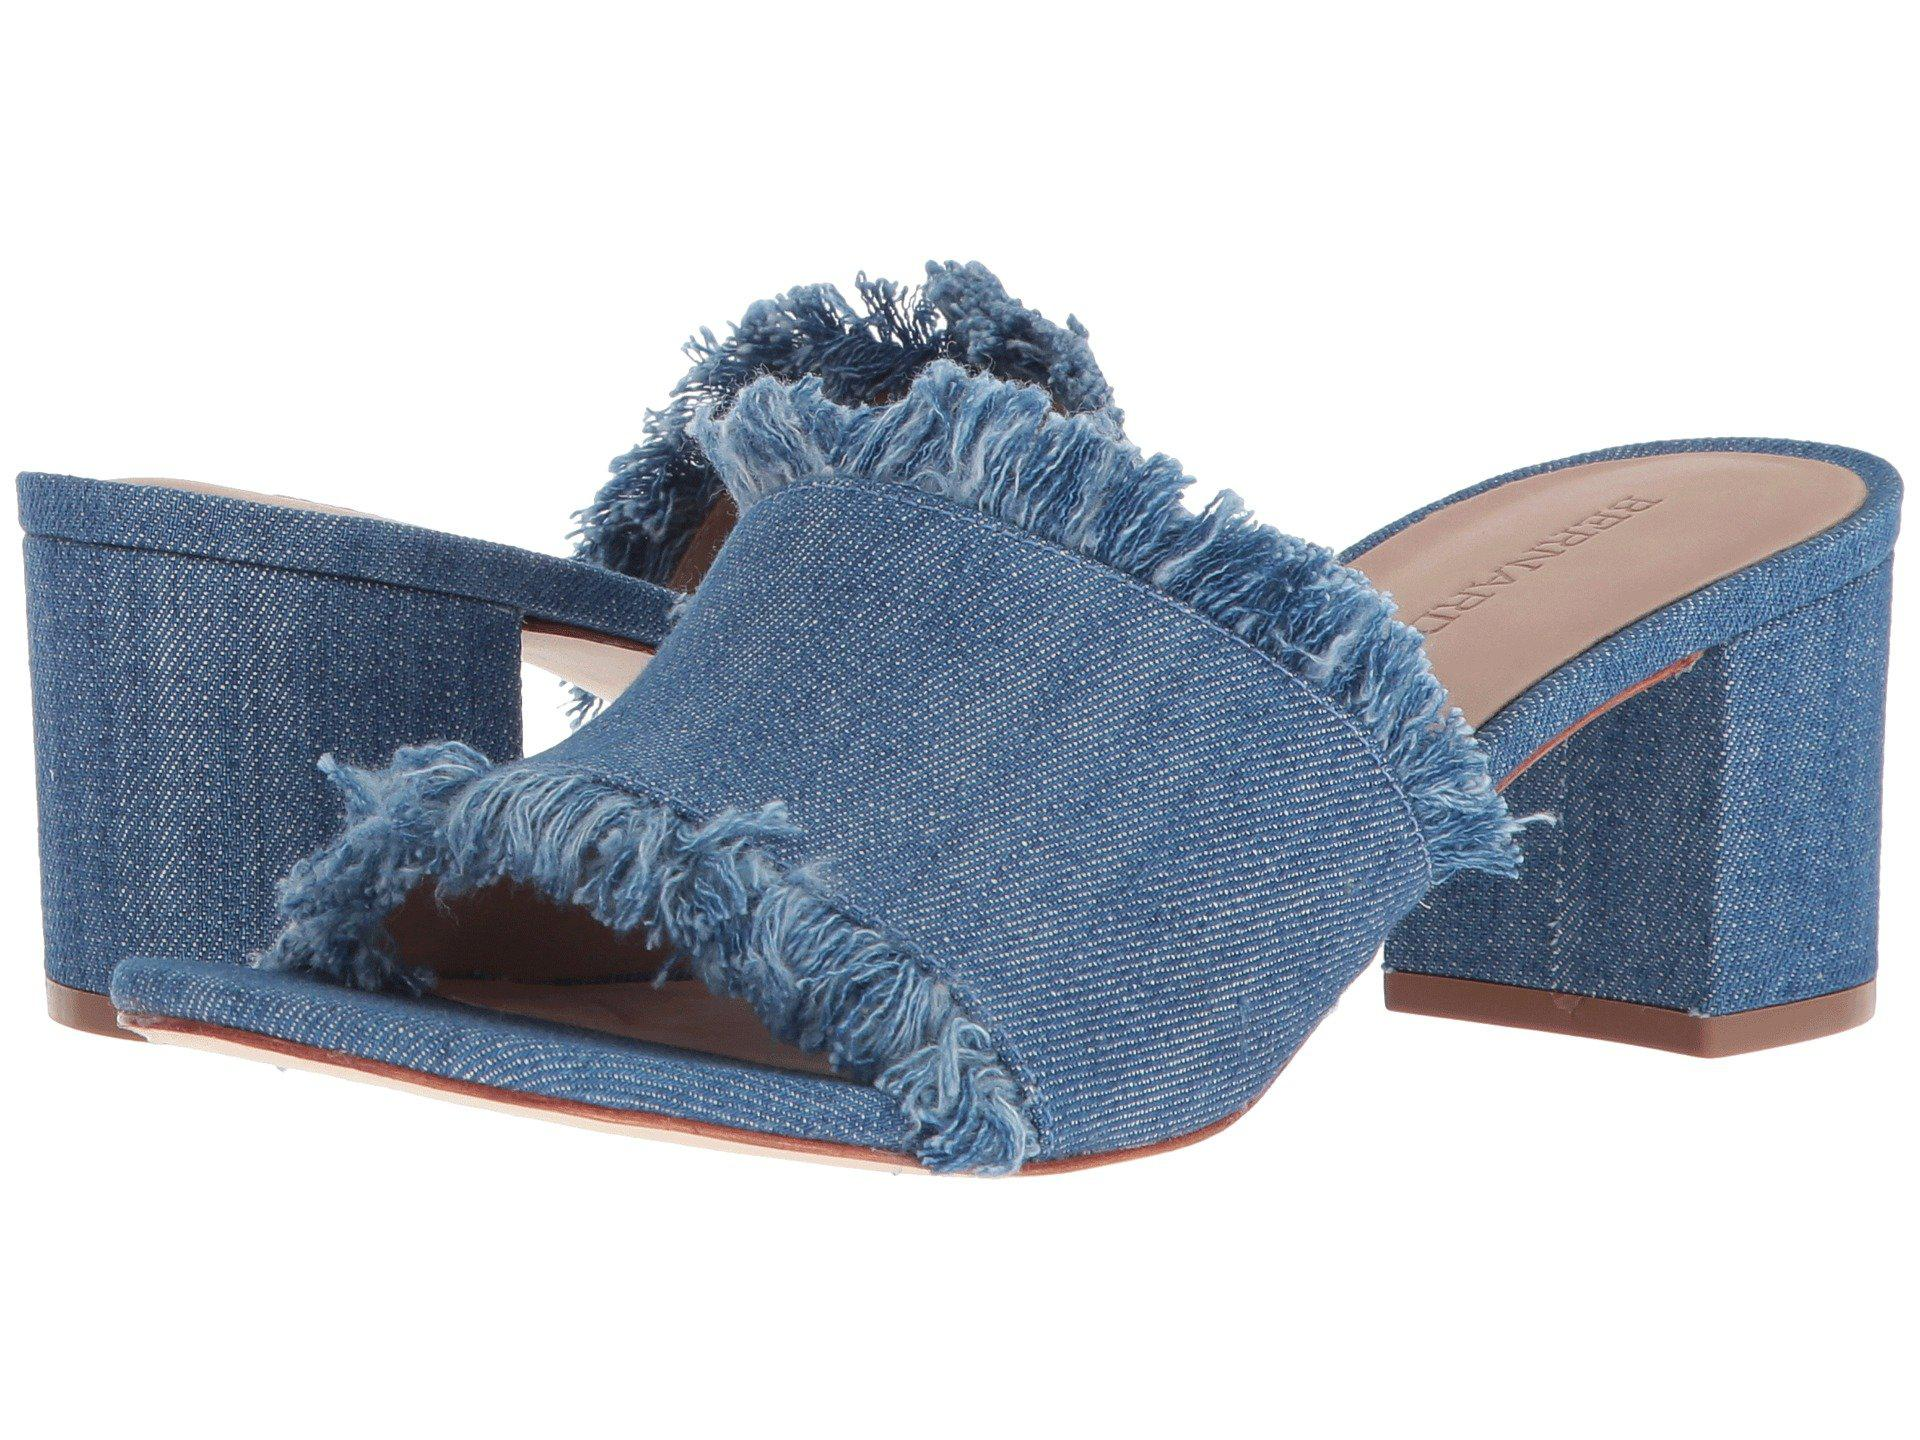 605953dbe2c1 Lyst - Bernardo Blaire Heeled Sandal in Blue - Save 55%